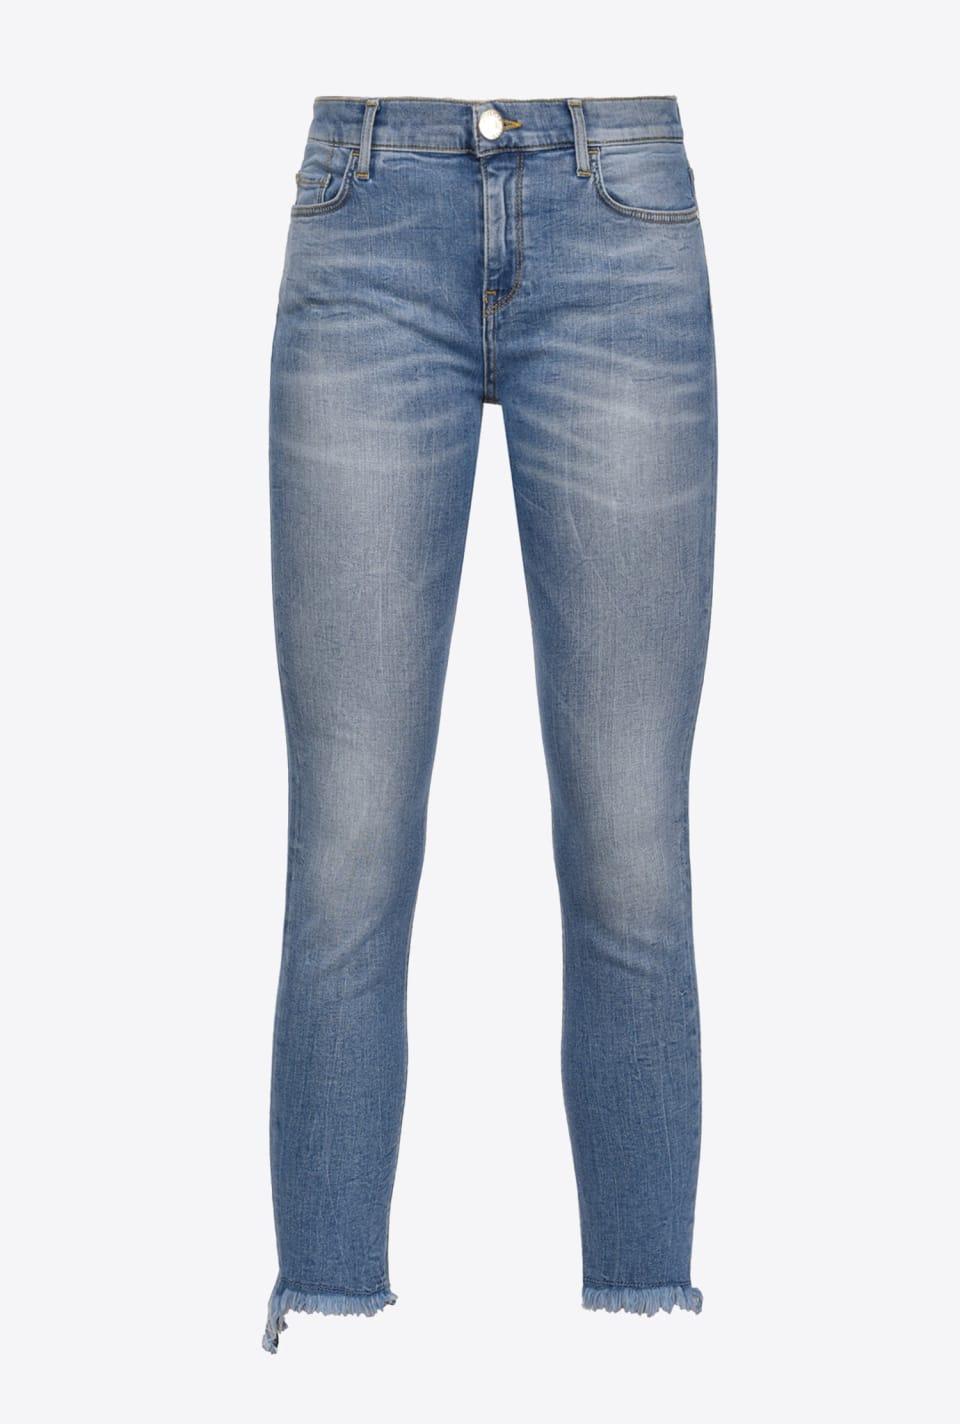 Skinny vintage jeans - Pinko